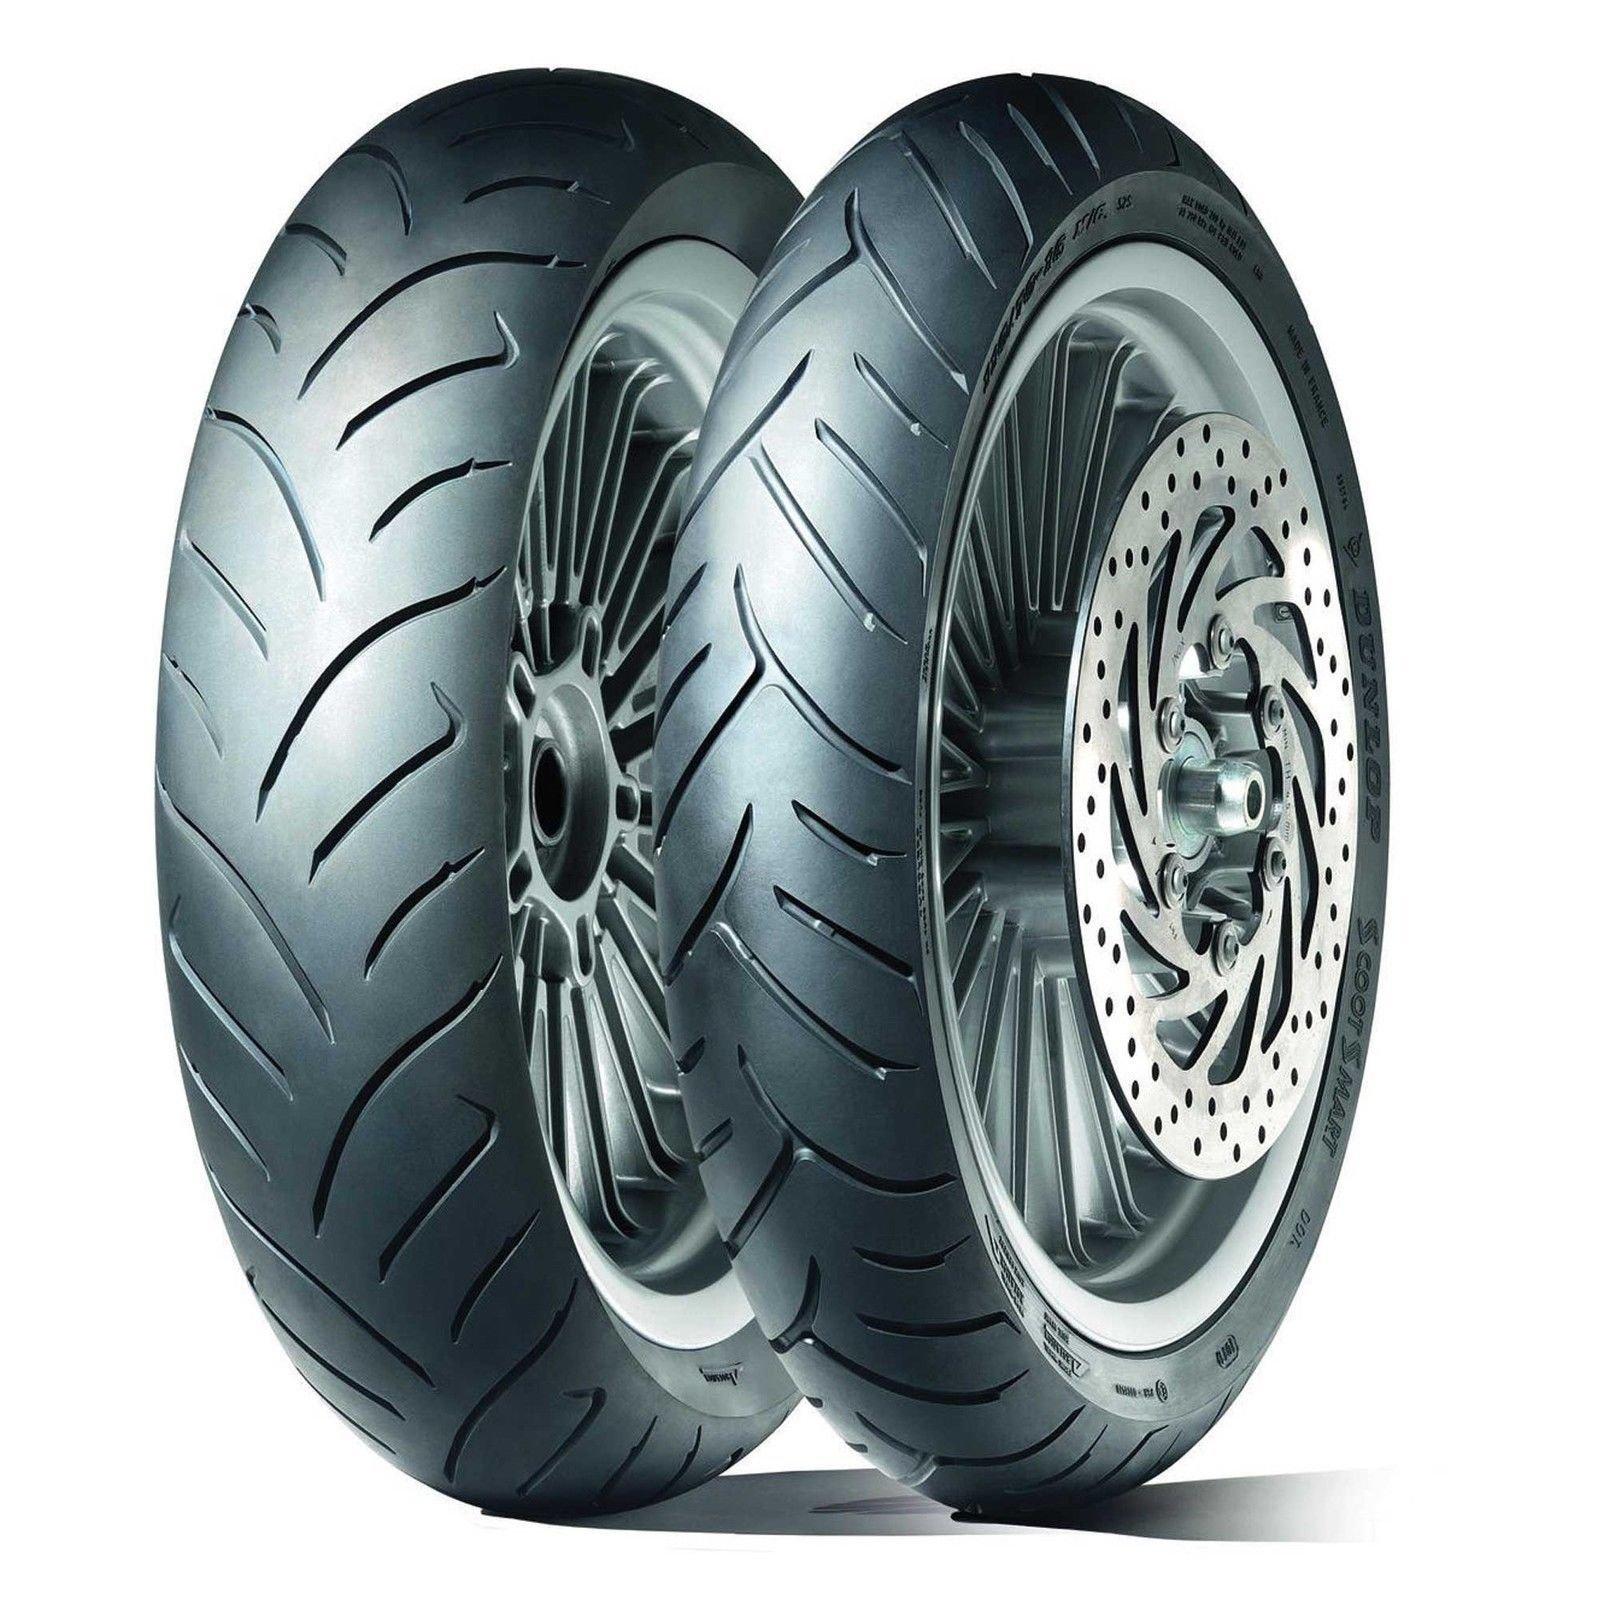 Шина для мотоцикла Dunlop ScootSmart 110/90 R13 55P TL Передняя (Front) (Артикул: 303995)